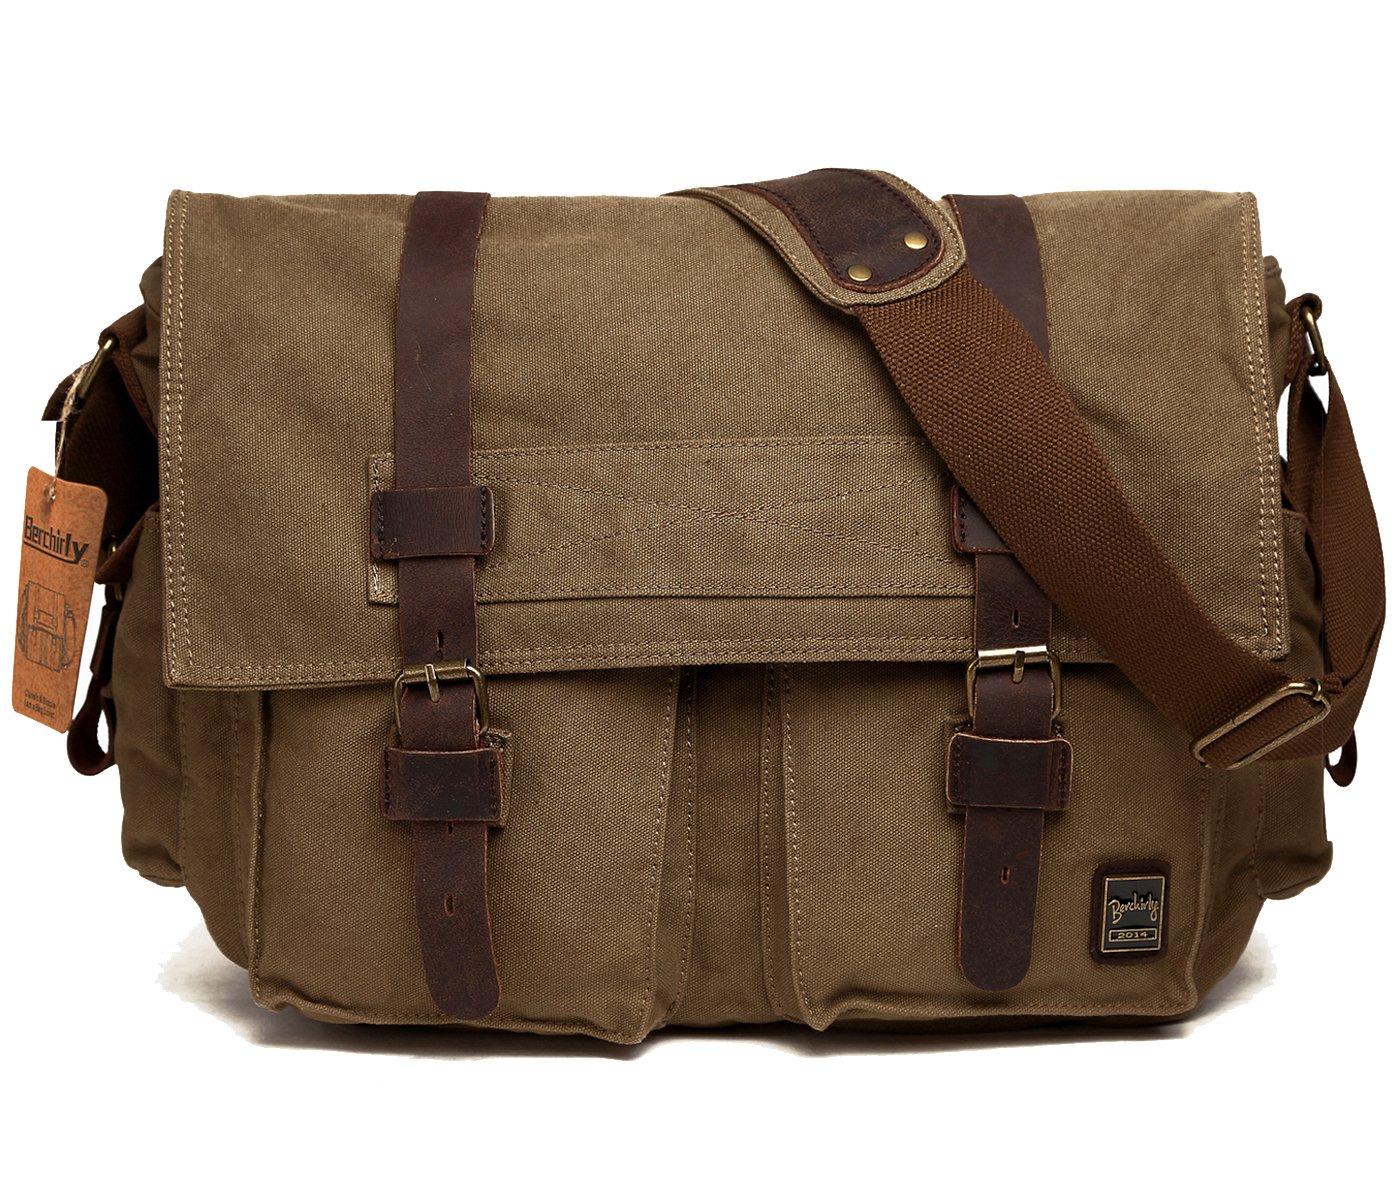 Camera Bag, Berchirly Designer Messenger Bag Large DSLR Gadget Bag for Men and Women 14.7 Inches, Army Green